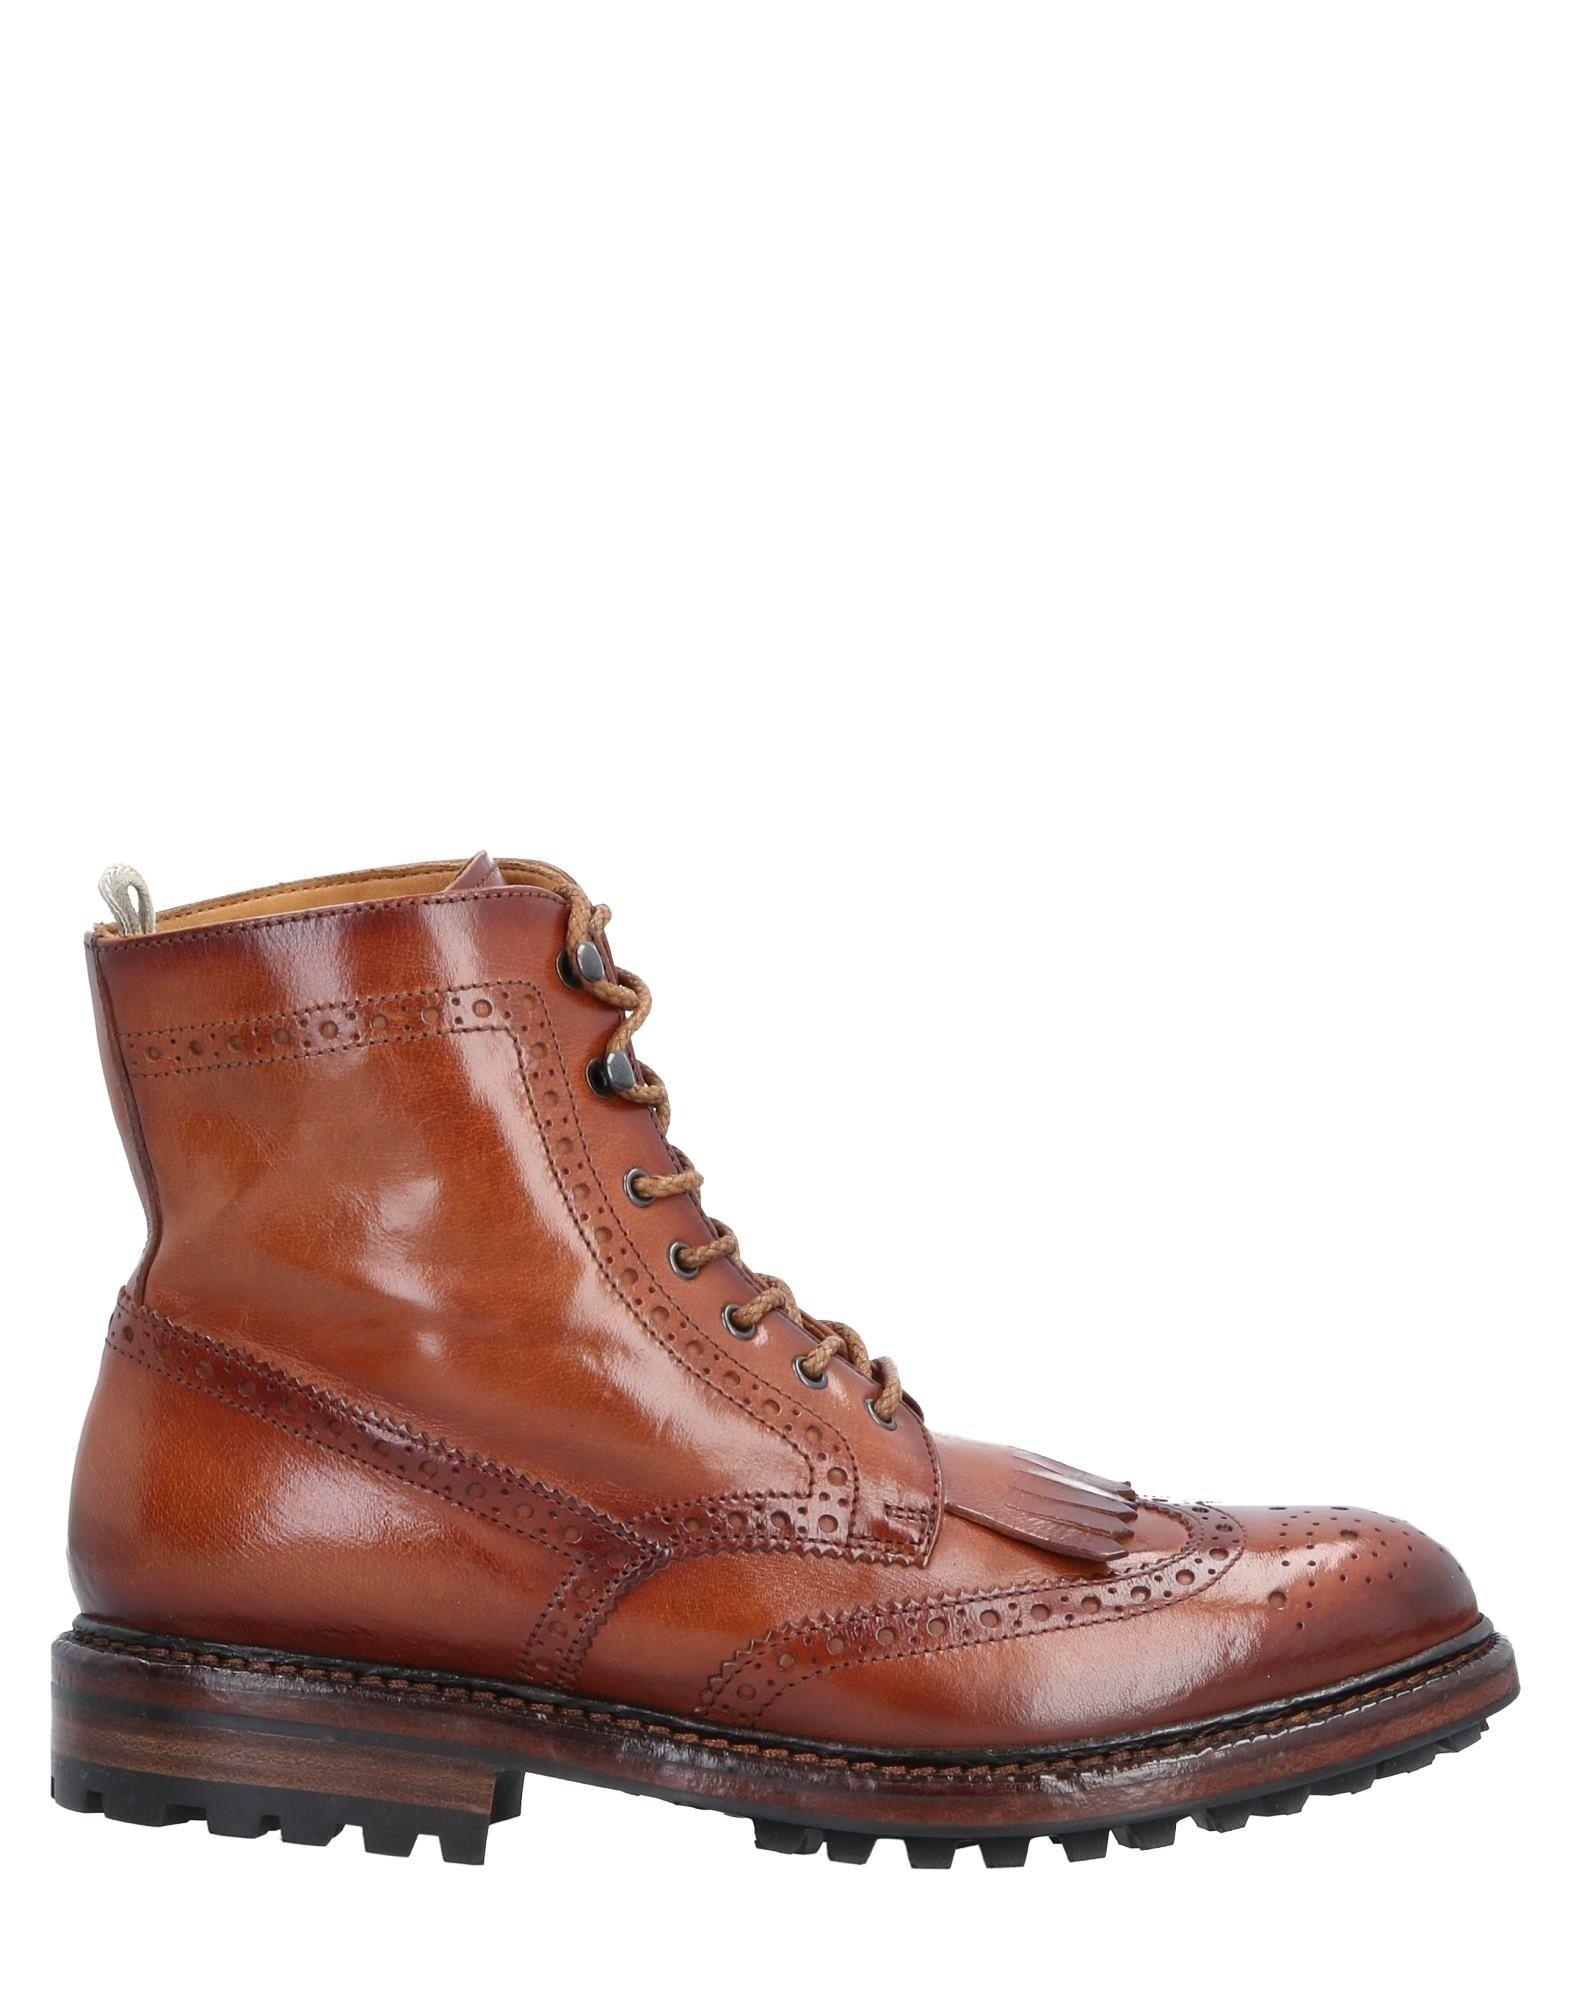 Officine Creative Italia Stiefelette Damen  11517234VP Neue Schuhe